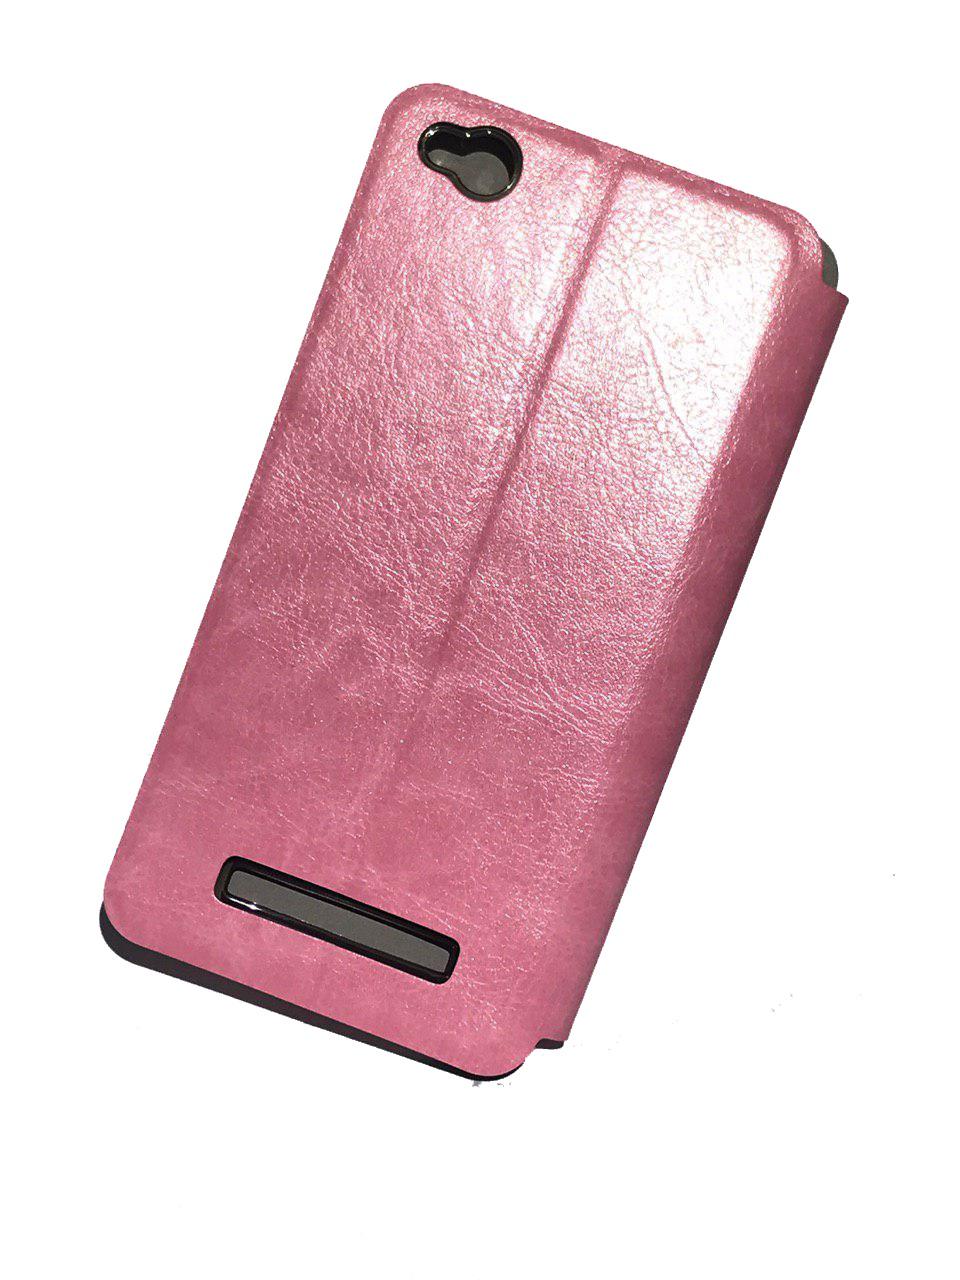 Чехол для Xiaomi Redmi 4A Книжка Xiaomi Redmi 4A Pink leather case colorful flip cover for xiaomi redmi 4a white